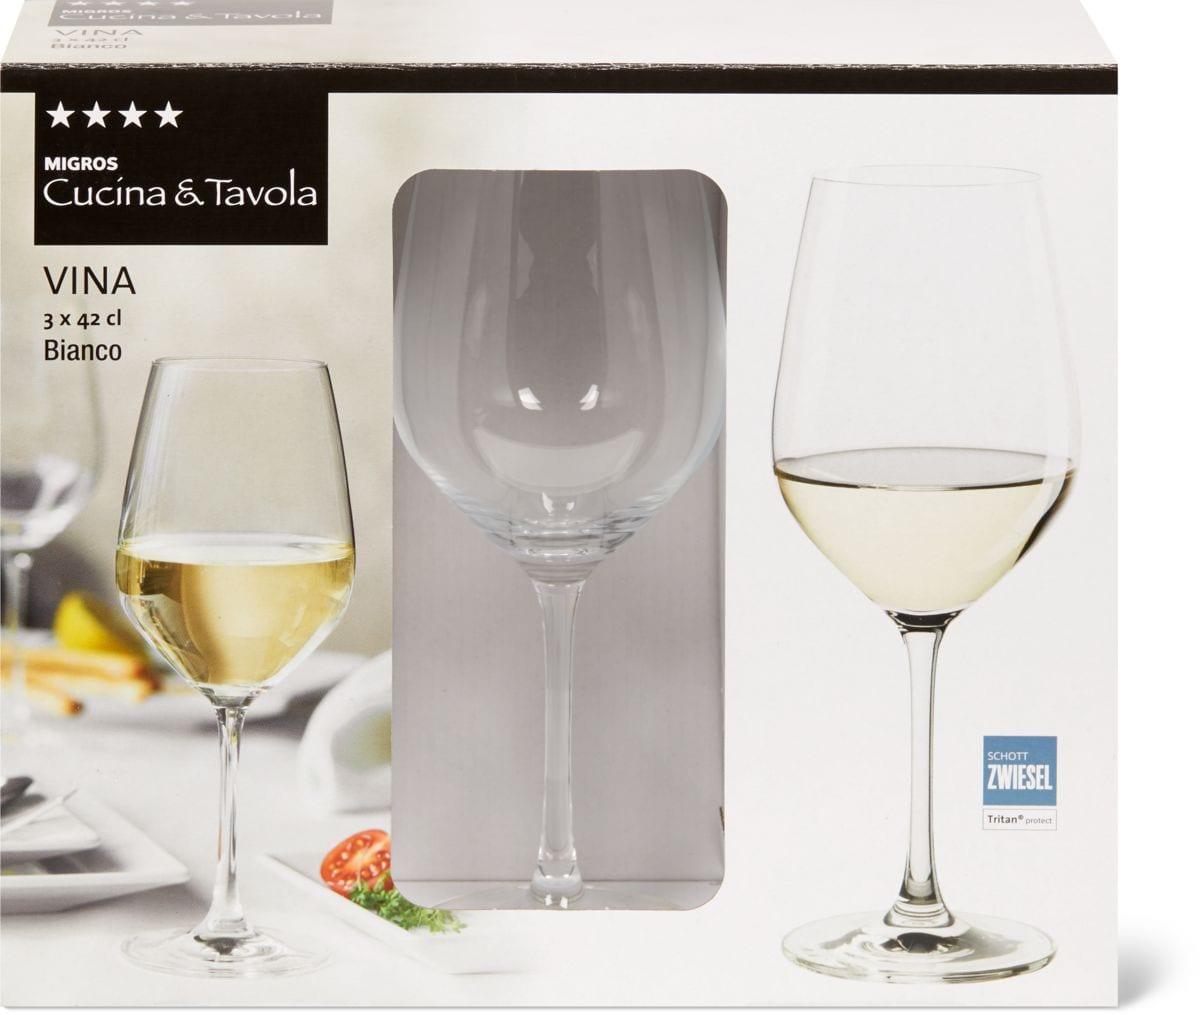 Cucina & Tavola VINA Bianco